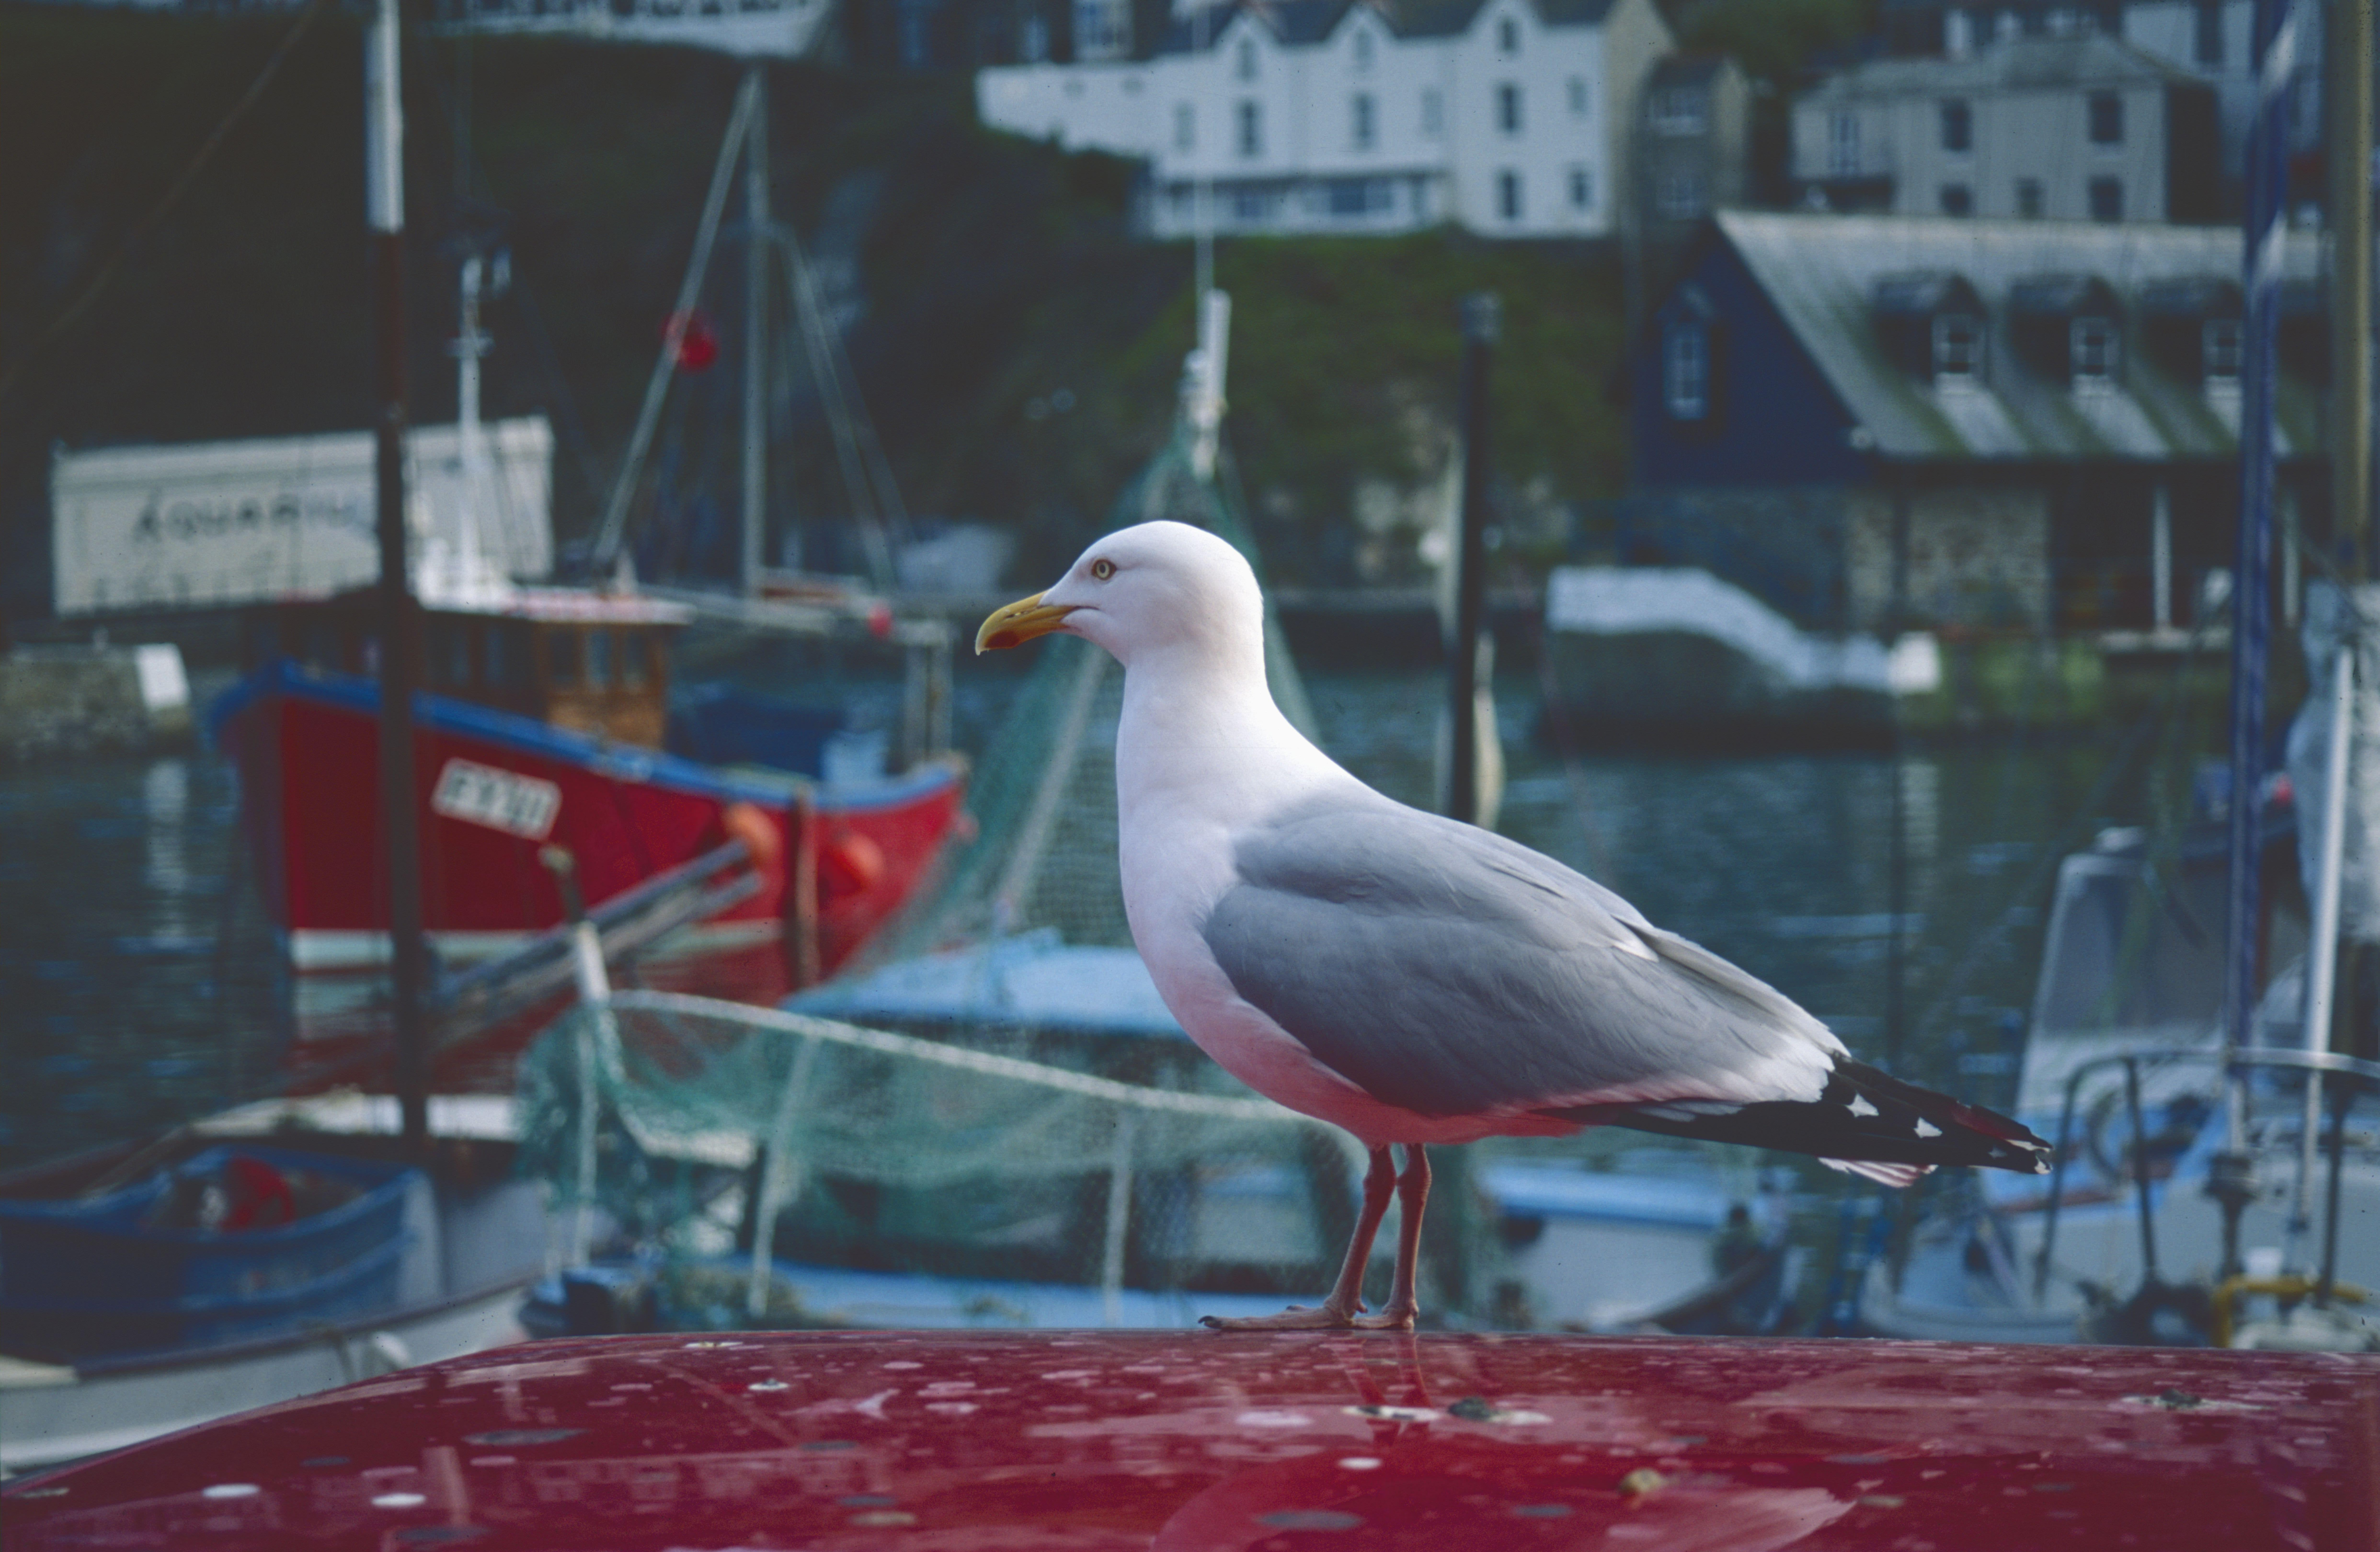 Plustek Opticfilm 8100 Film Scanner Review | ePHOTOzine